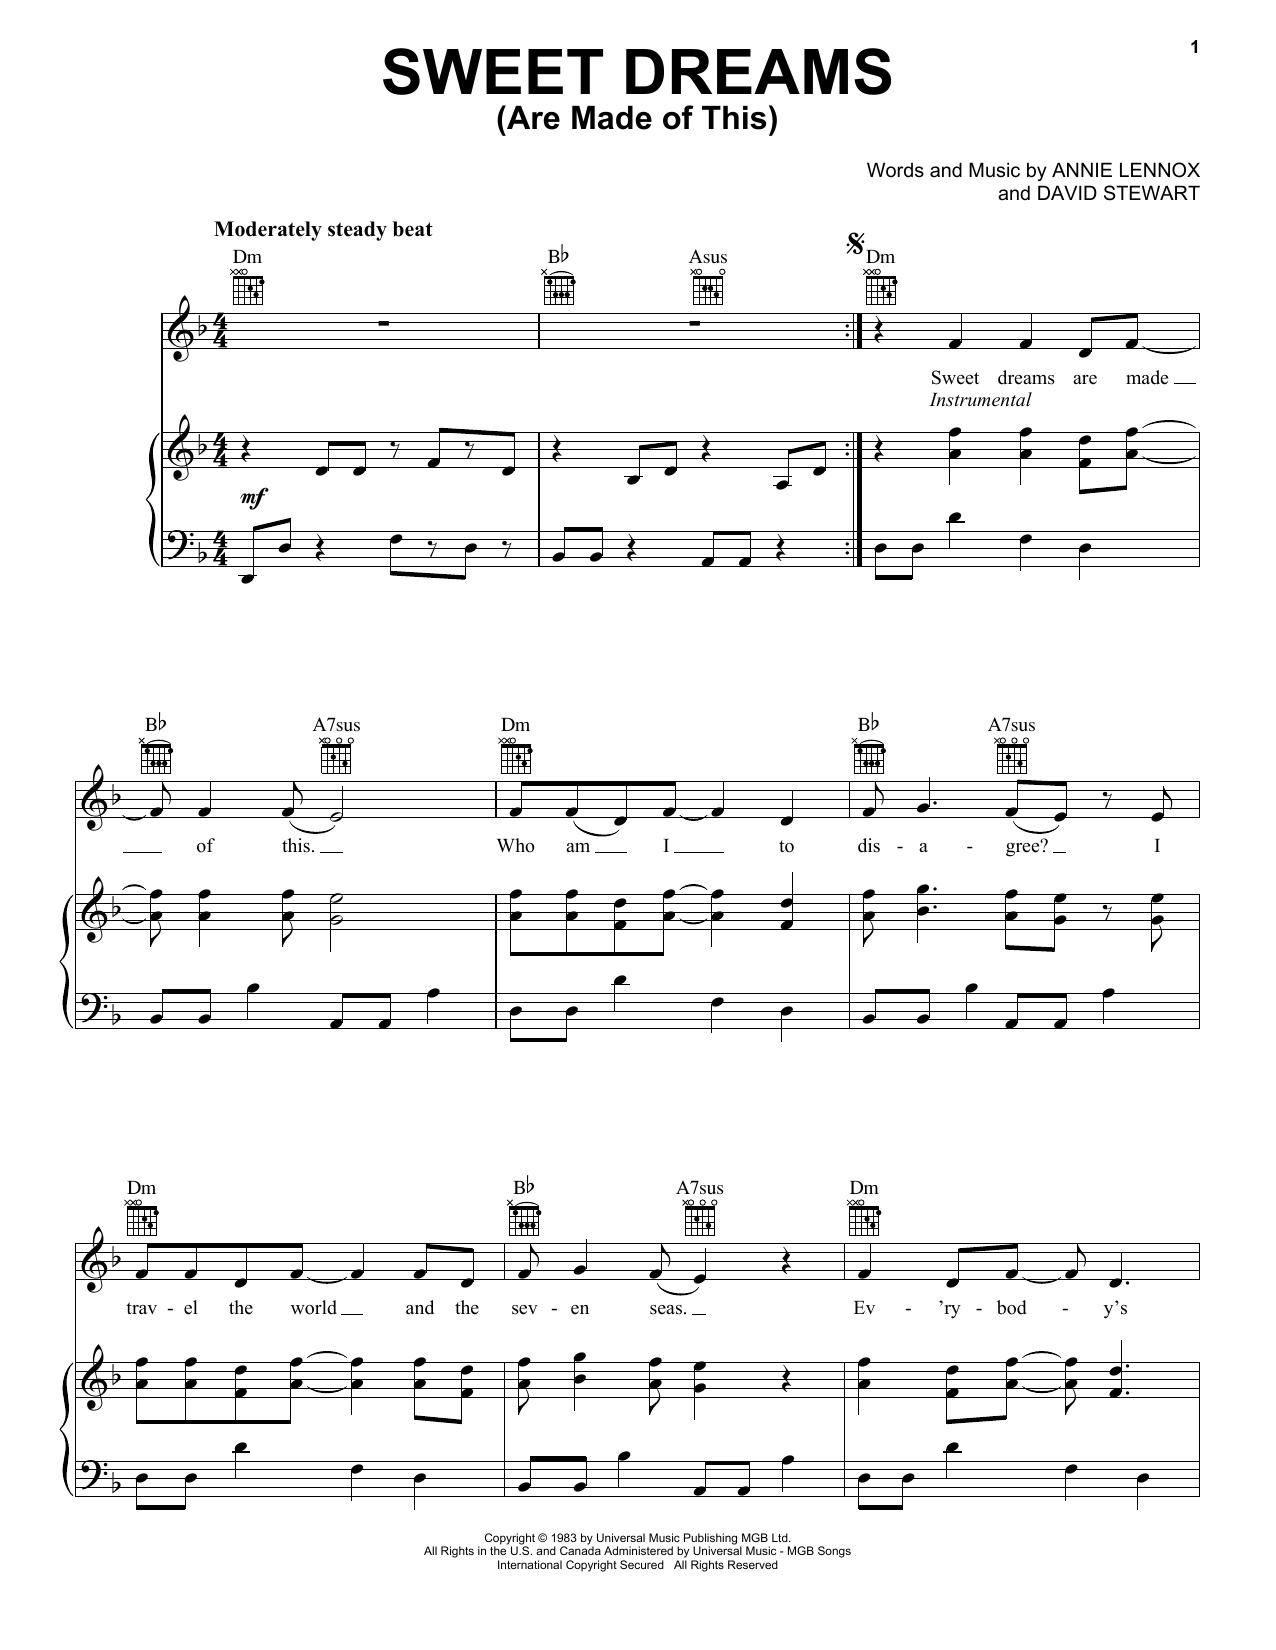 Sheet Music Digital Files To Print Licensed Eurythmics Digital